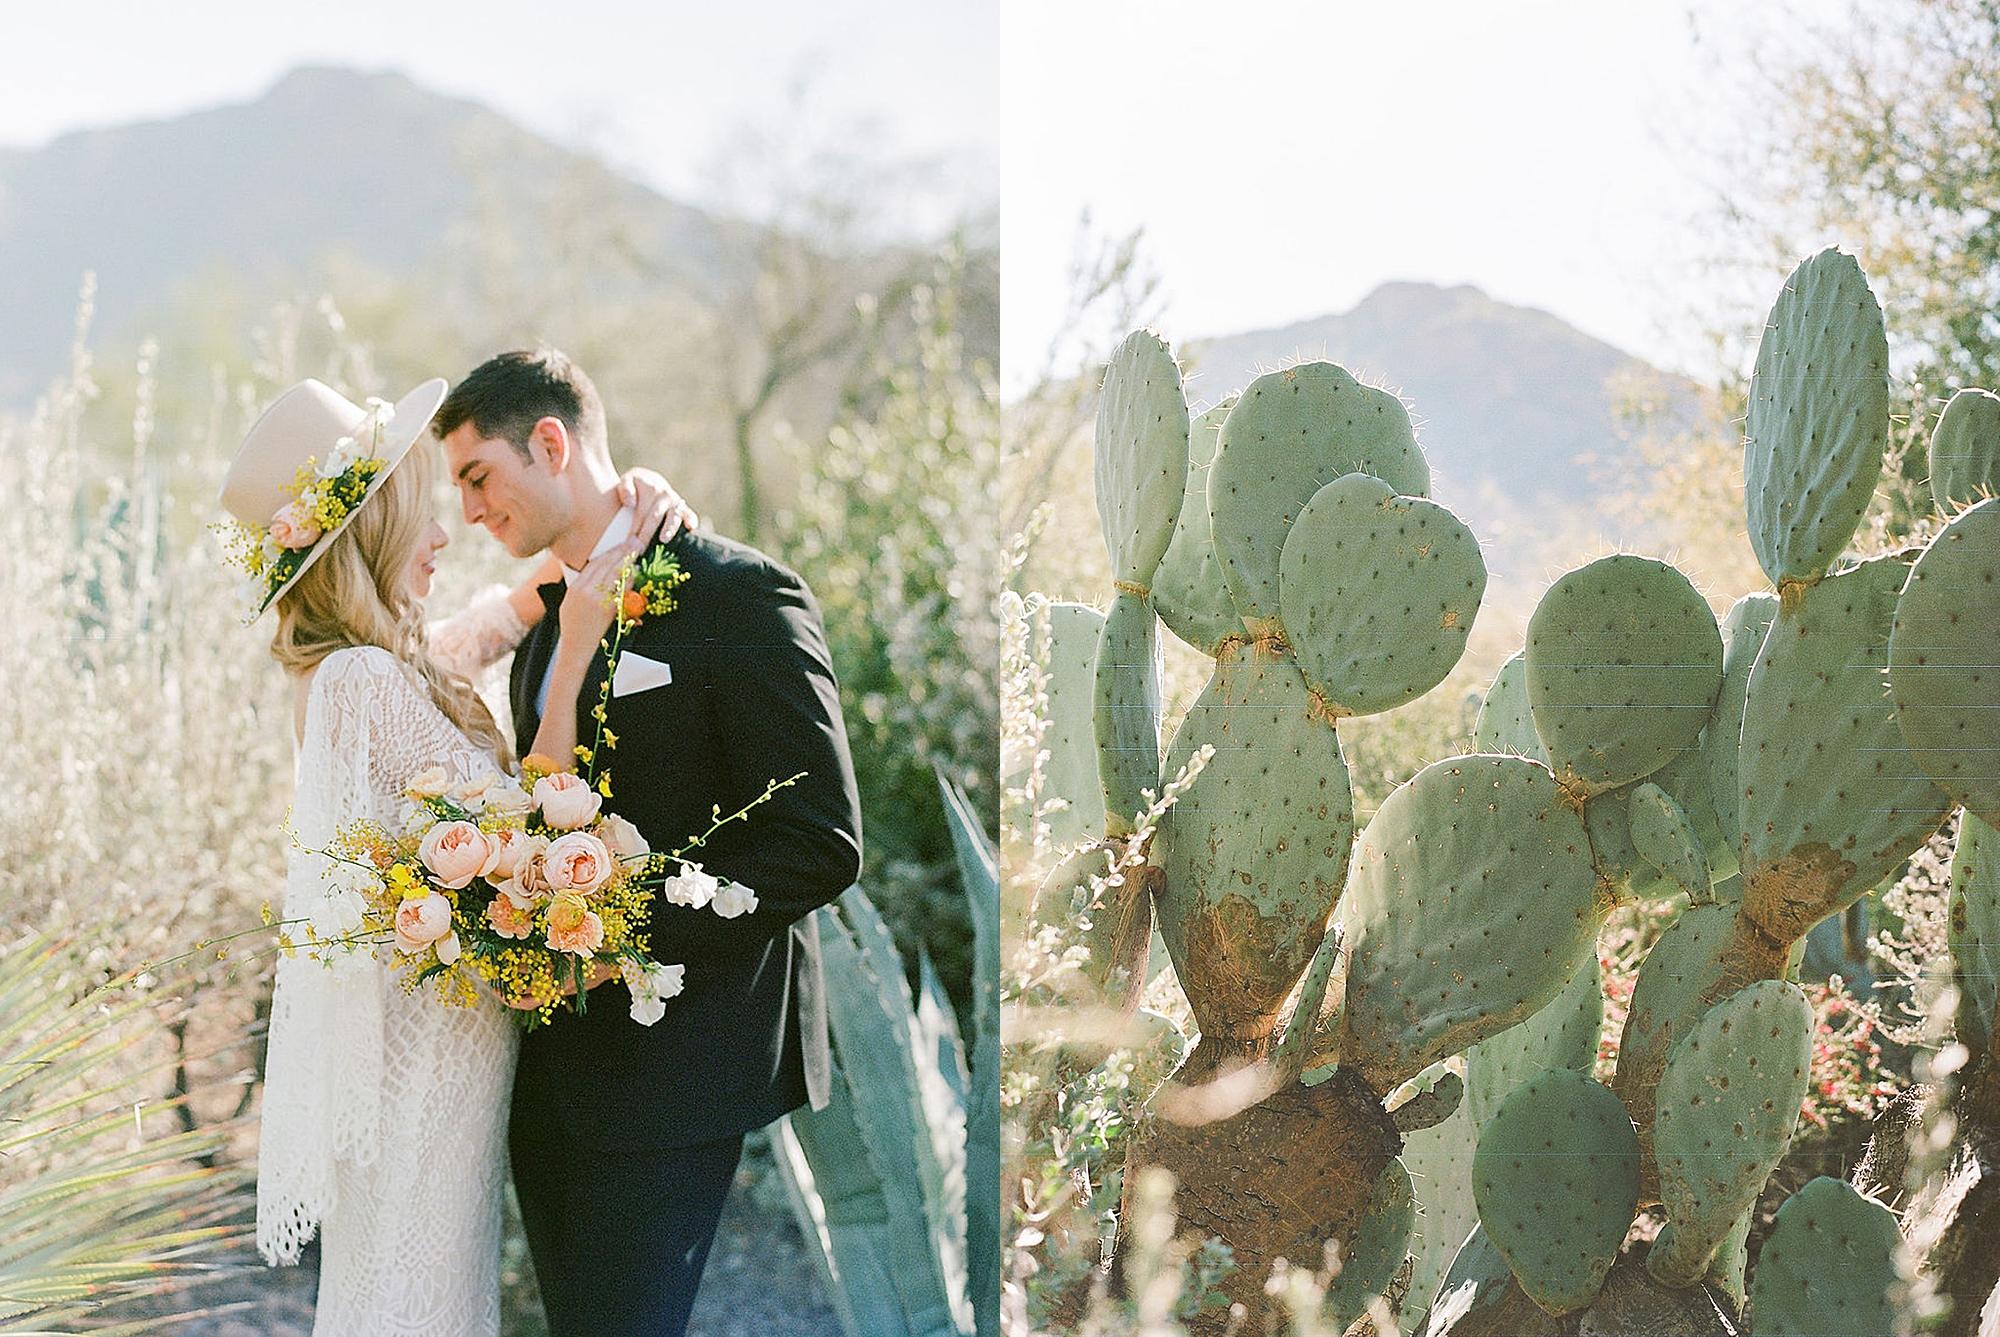 El Chorro Sedona AZ Wedding Photography by Magi Fisher of Magdalena Studios 0037